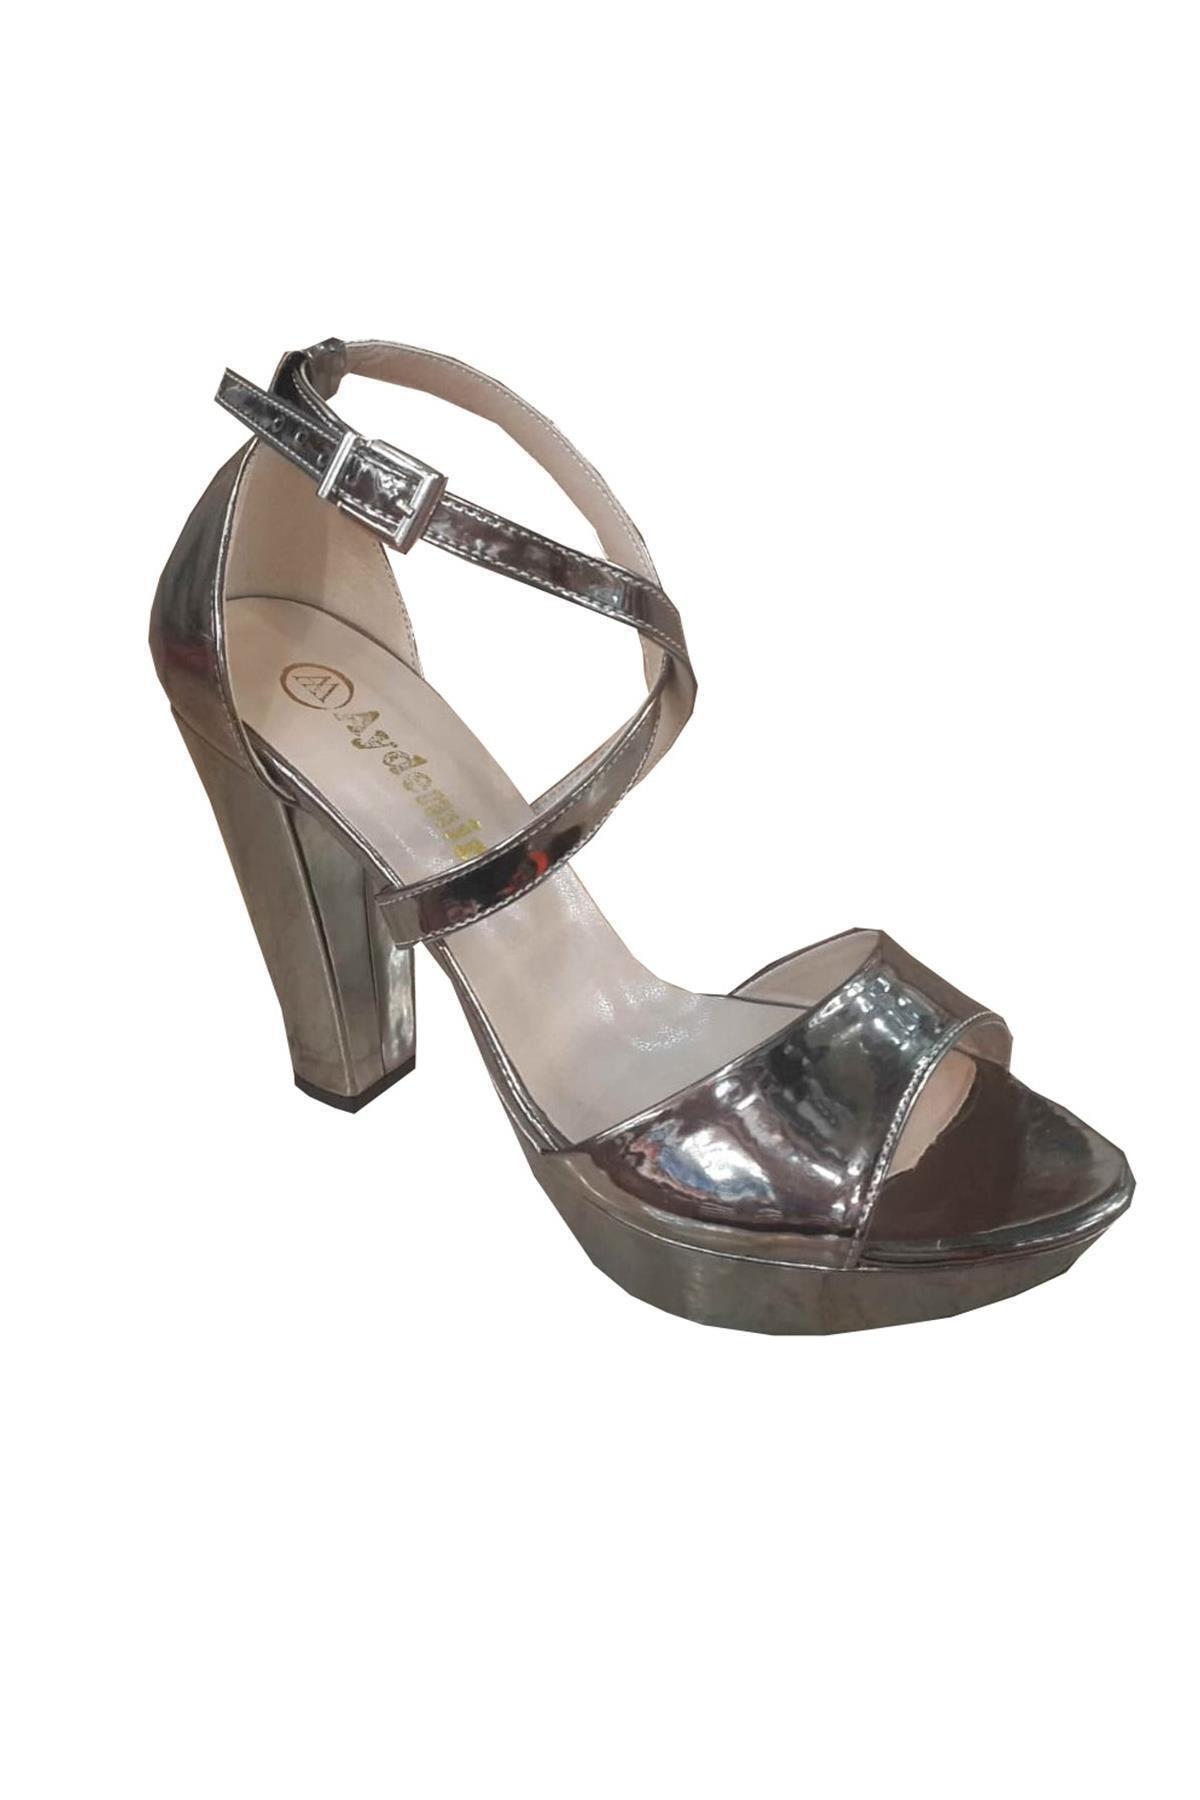 AYDEMİR AYAKKABI Aydemir 1920 Rugan 20mm Platform Kadın Sandalet 1